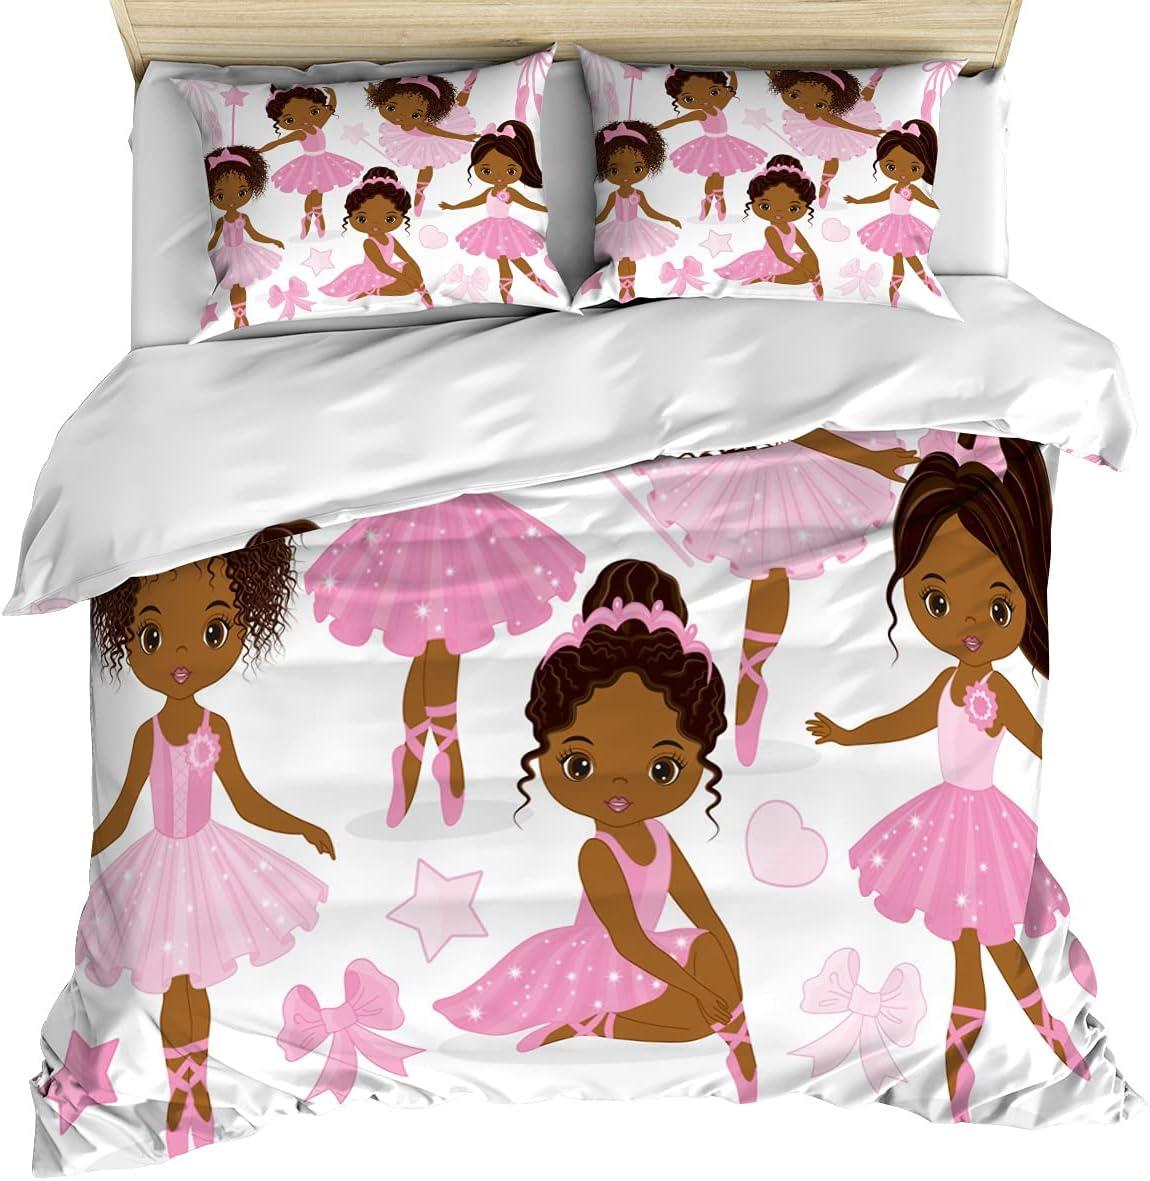 Ballerina Girl Comforter Covers Sets Bow Nippon regular agency Dancer Micr Houston Mall Cute Black